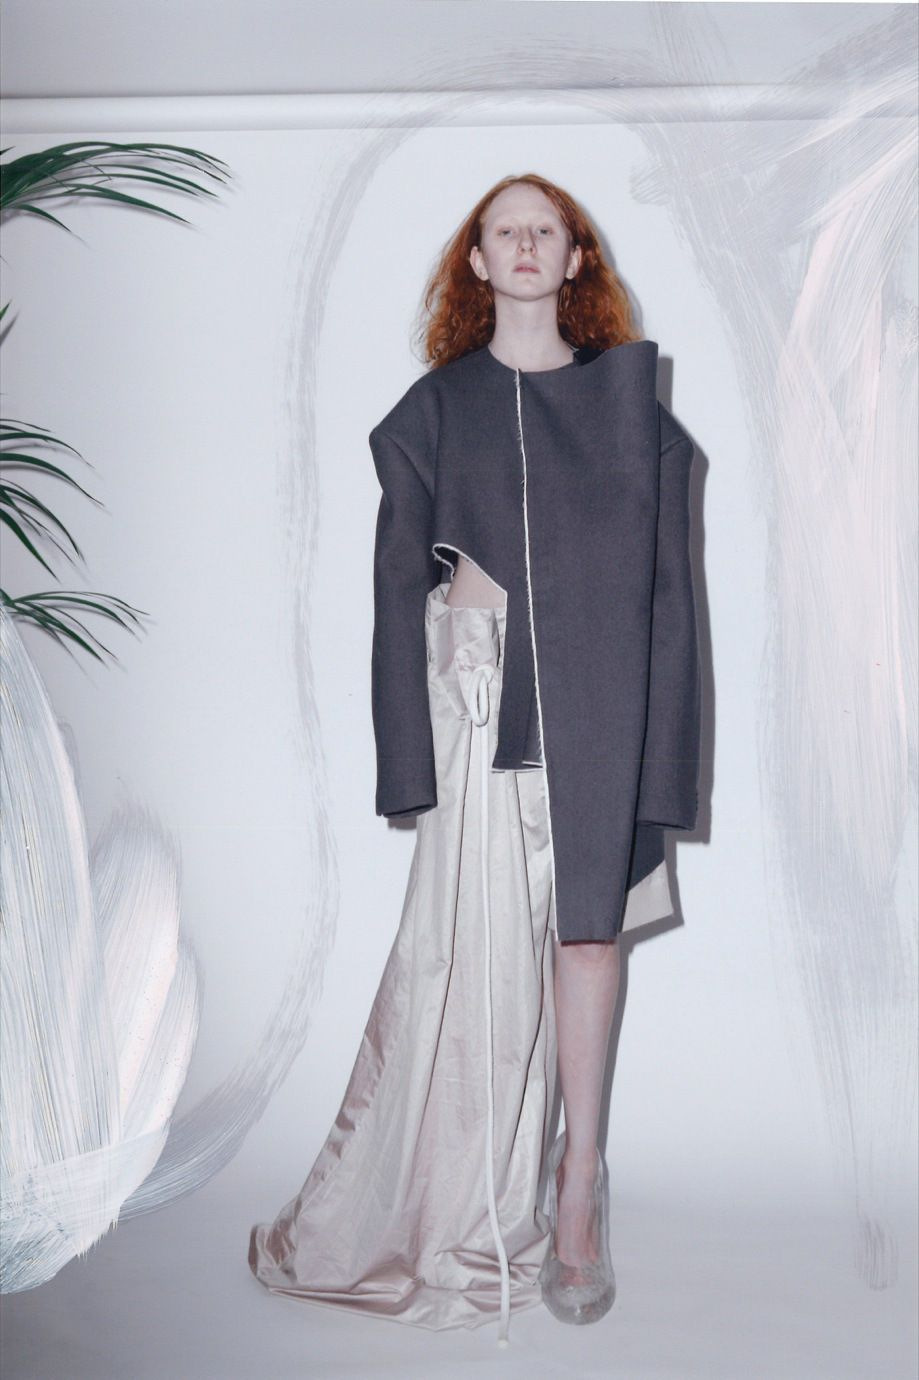 1granary_csm_central_saint_martins_masha_reva_lookbook18 #fashion #structure